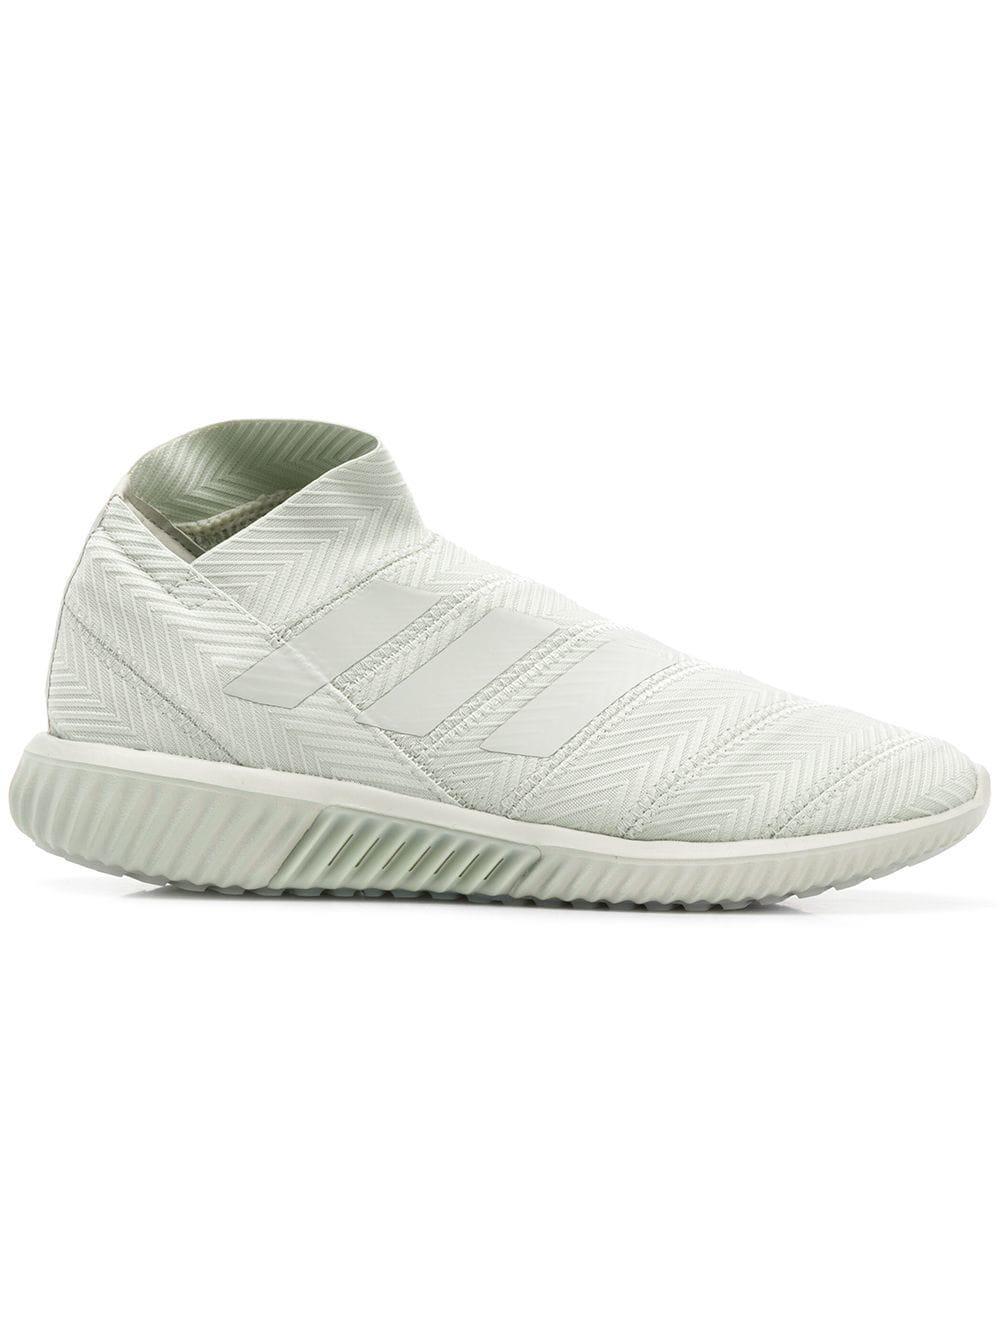 042c94985 adidas Nemeziz Tango 18.1 Sneakers in Gray for Men - Lyst